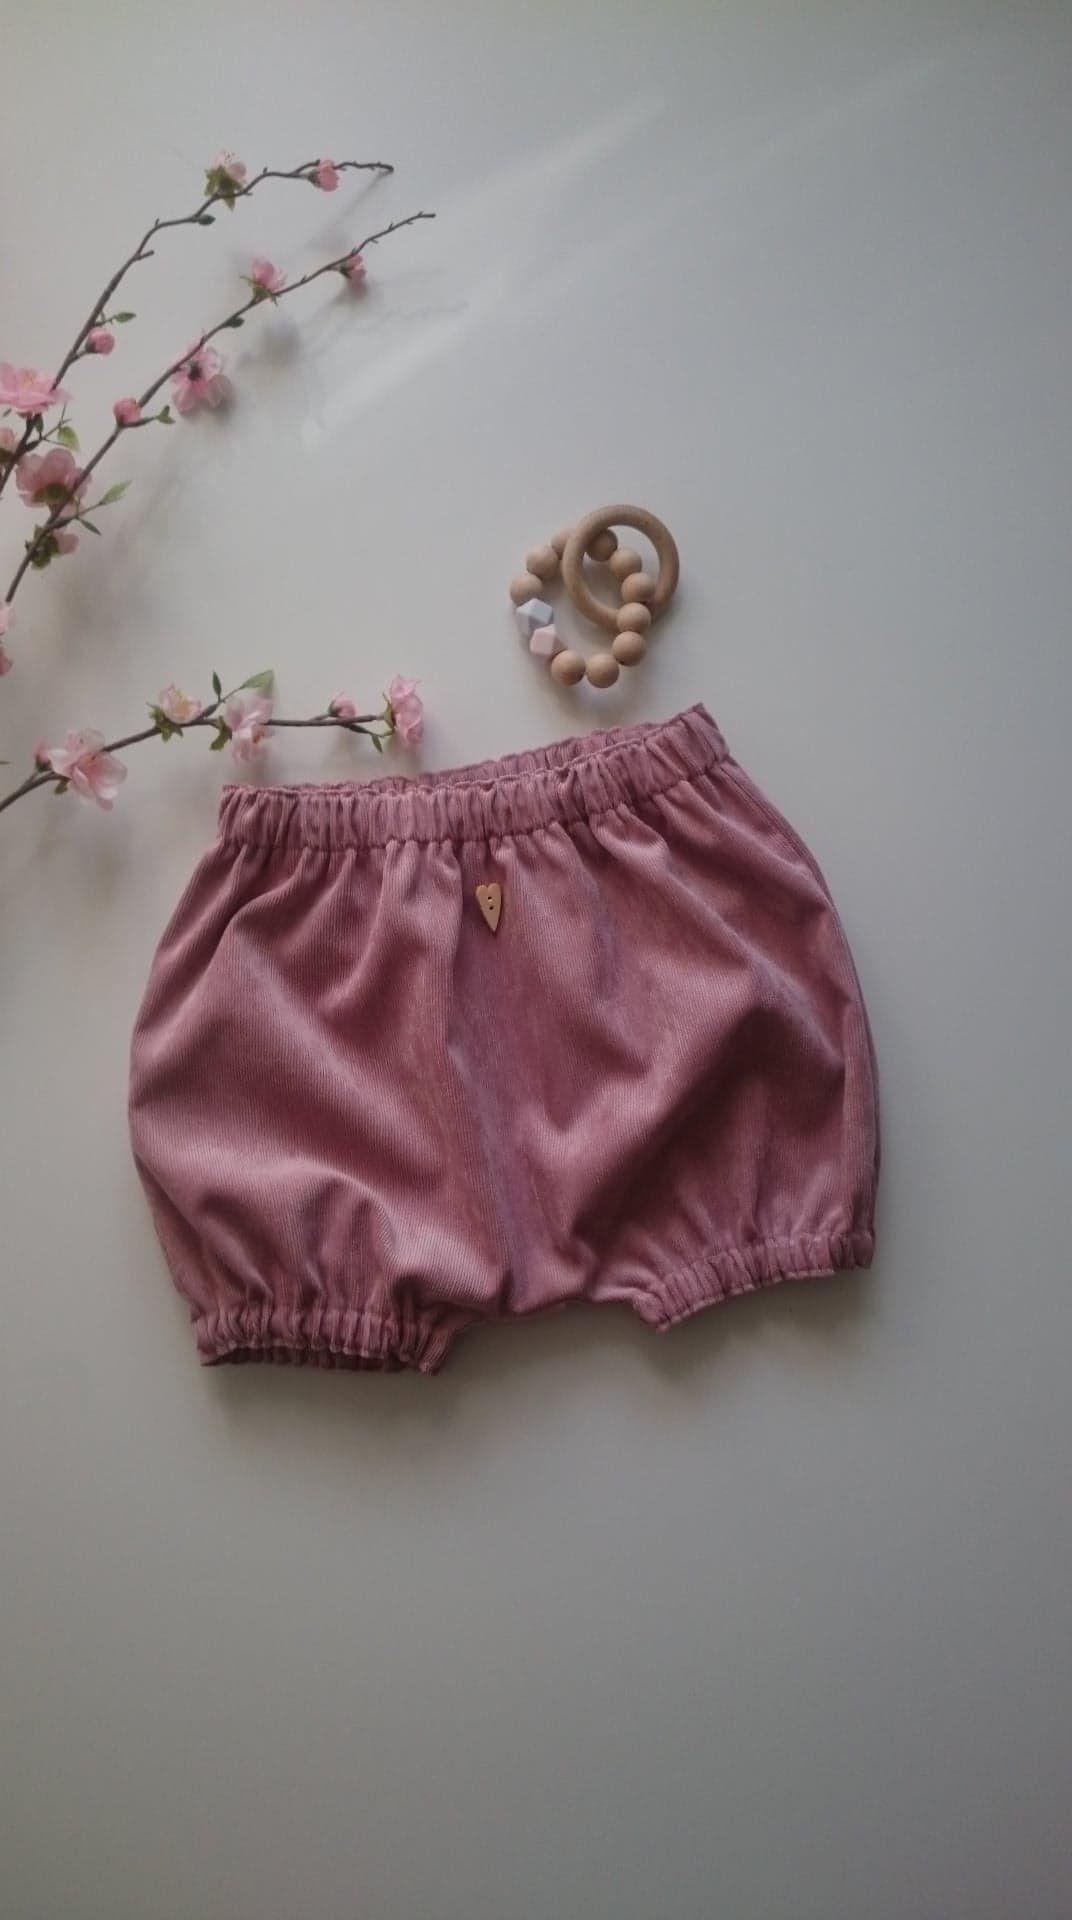 Bloomers Cord Shorts Baby Kind Old Pink Game Pants Short Pants Girl Pants Cordhose Corlihose Shorts Pumphose Cordpumphosis Bloomers Fashion Boho Shorts